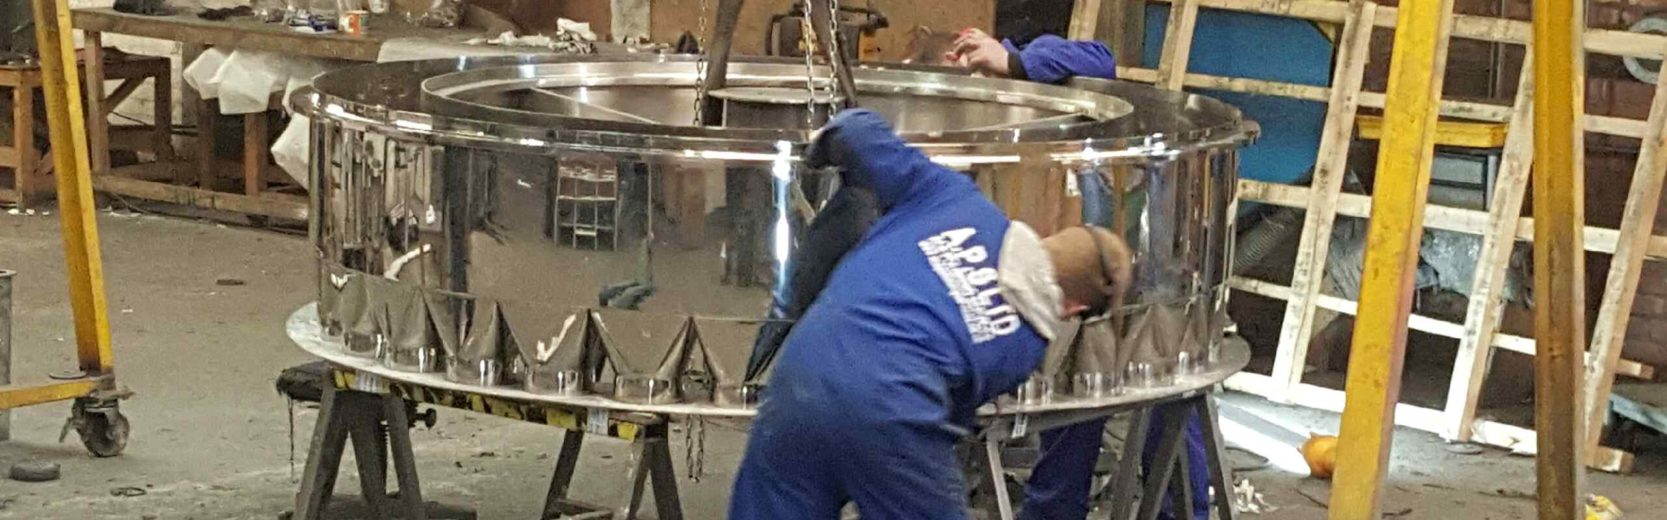 mirror polishing in the workshop